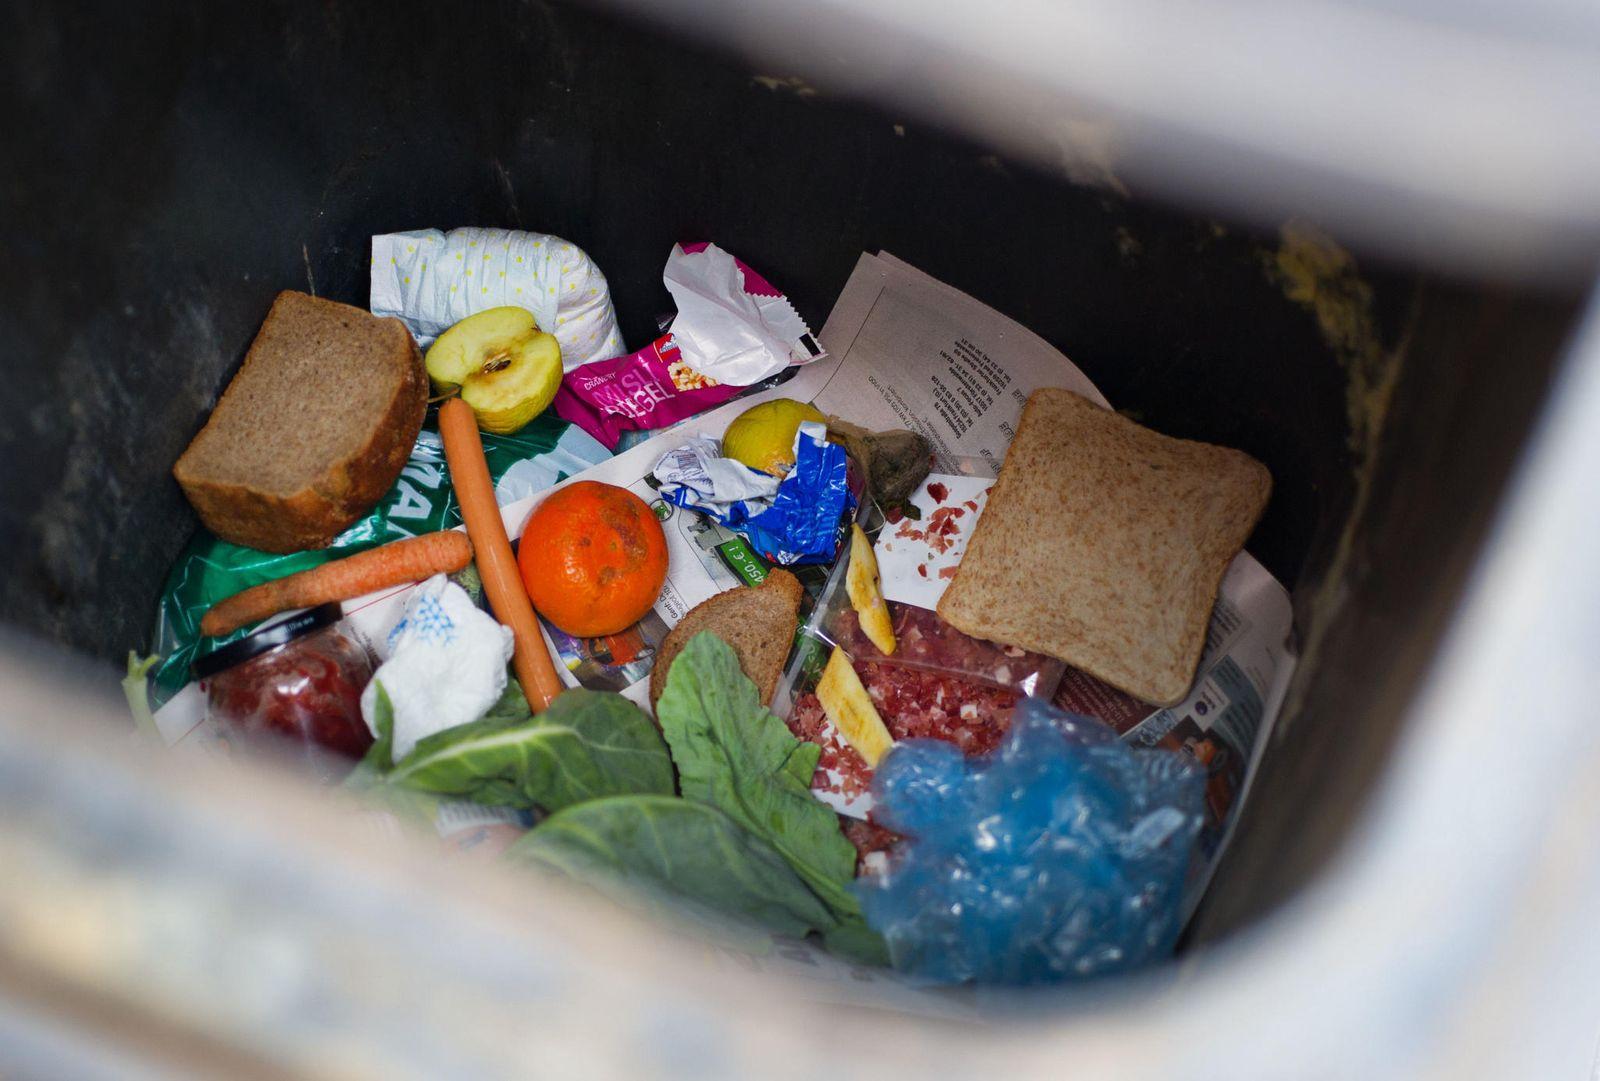 Lebensmittelverschwendung Dpalth Patrick Pleul